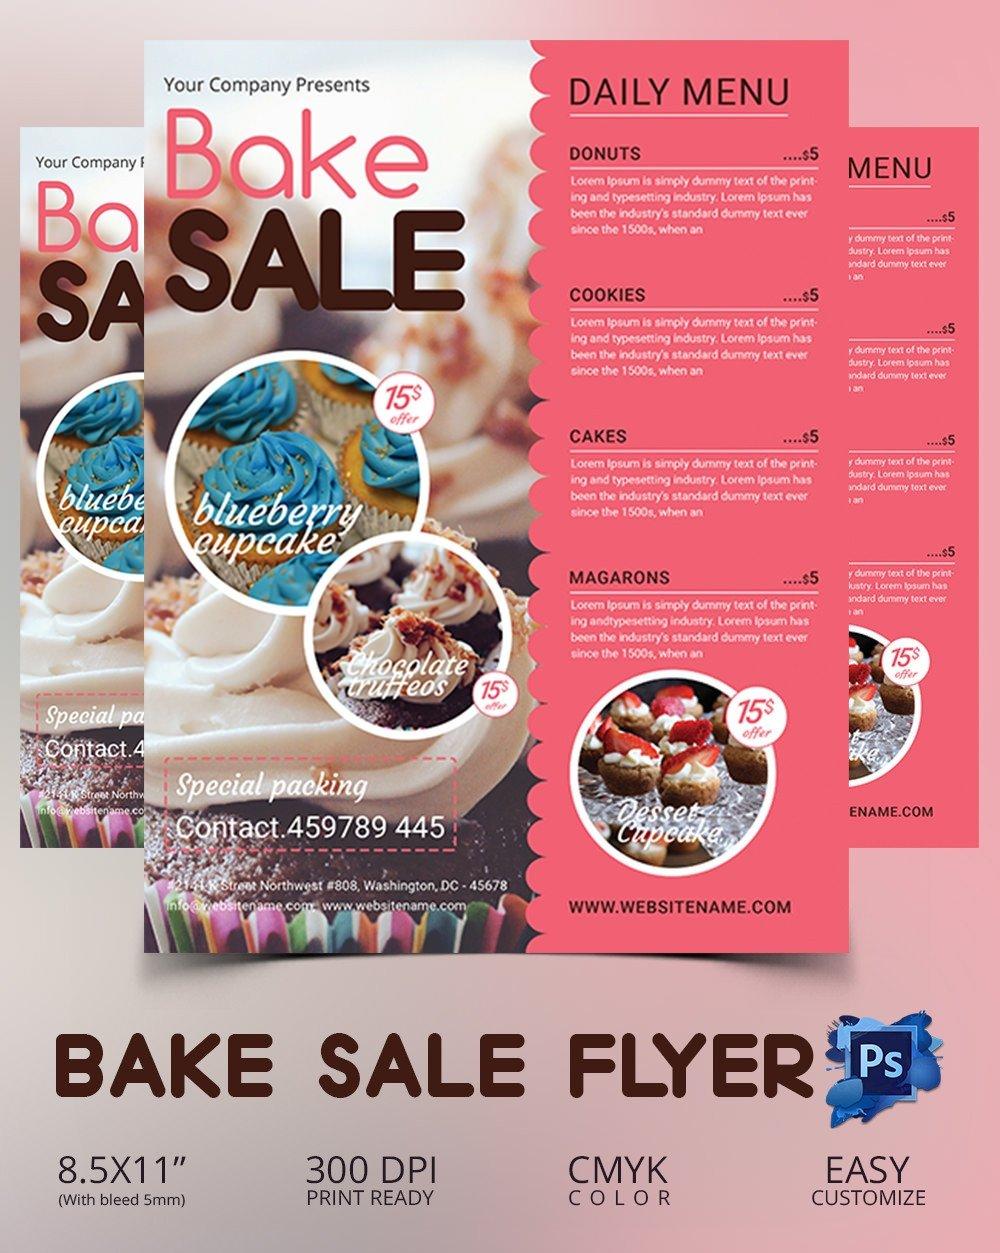 Bake Sale Flyer Template Bake Sale Flyer Template 34 Free Psd Indesign Ai